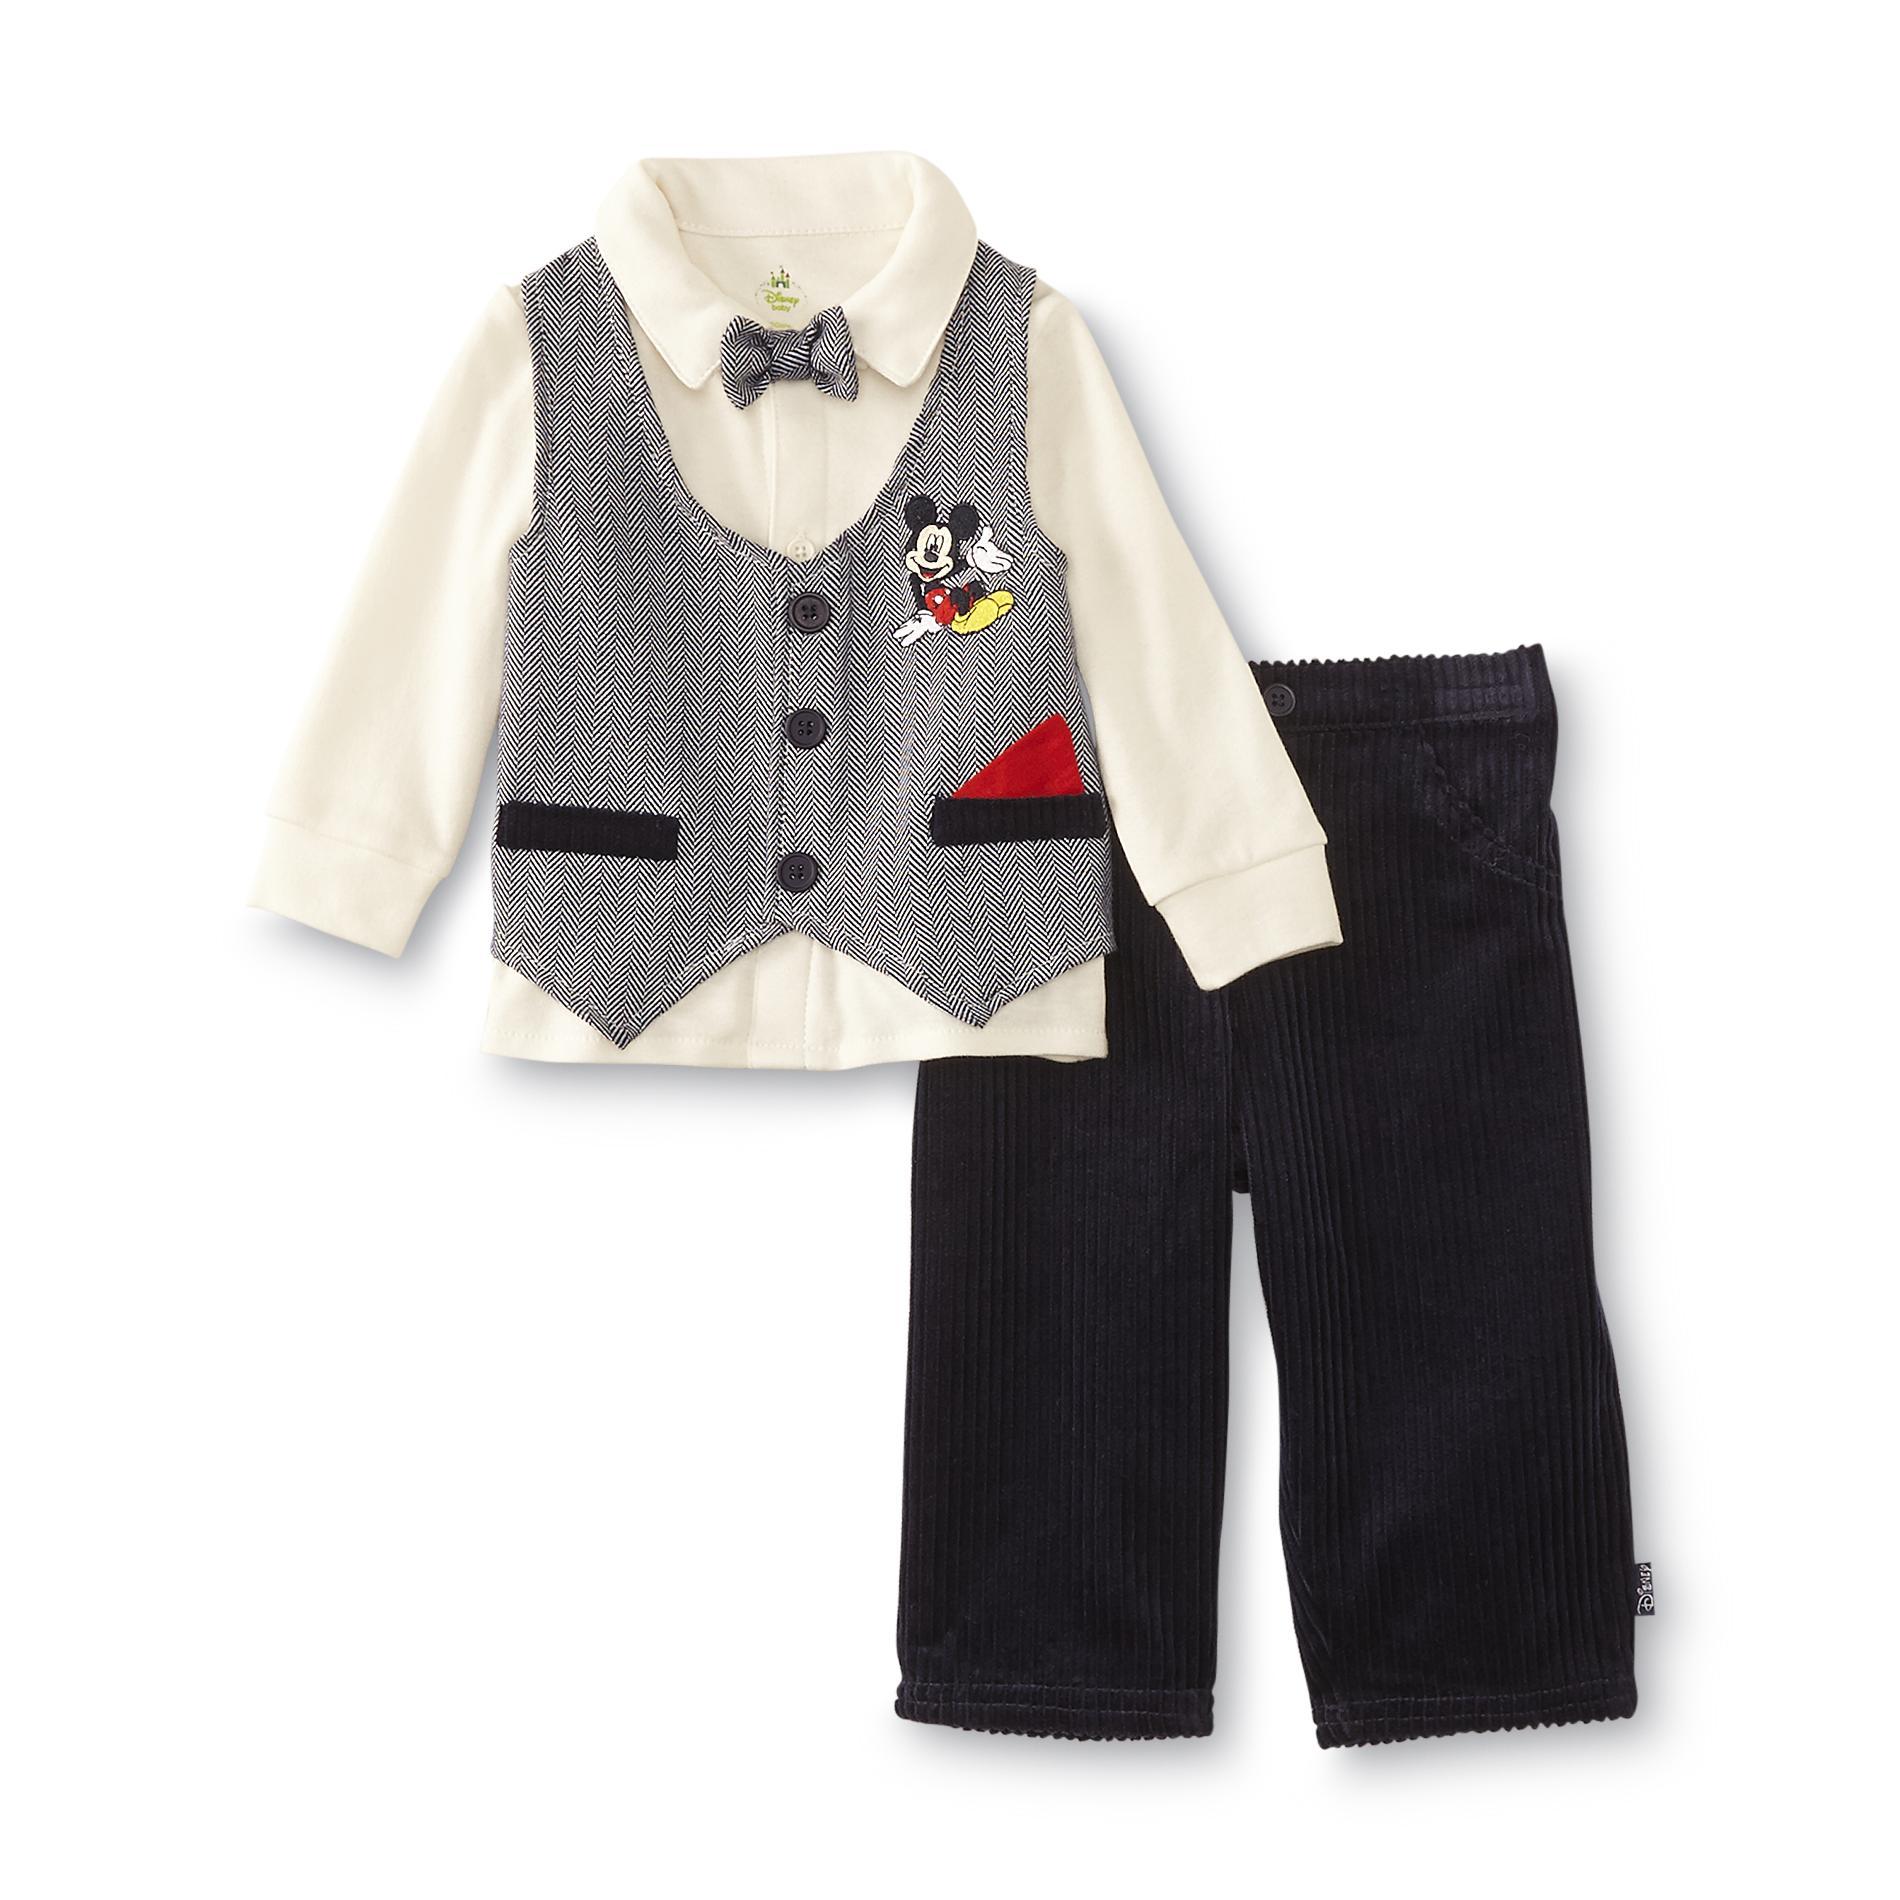 Disney Baby Mickey Mouse Newborn Boy's Shirt, Pants & Bow Tie